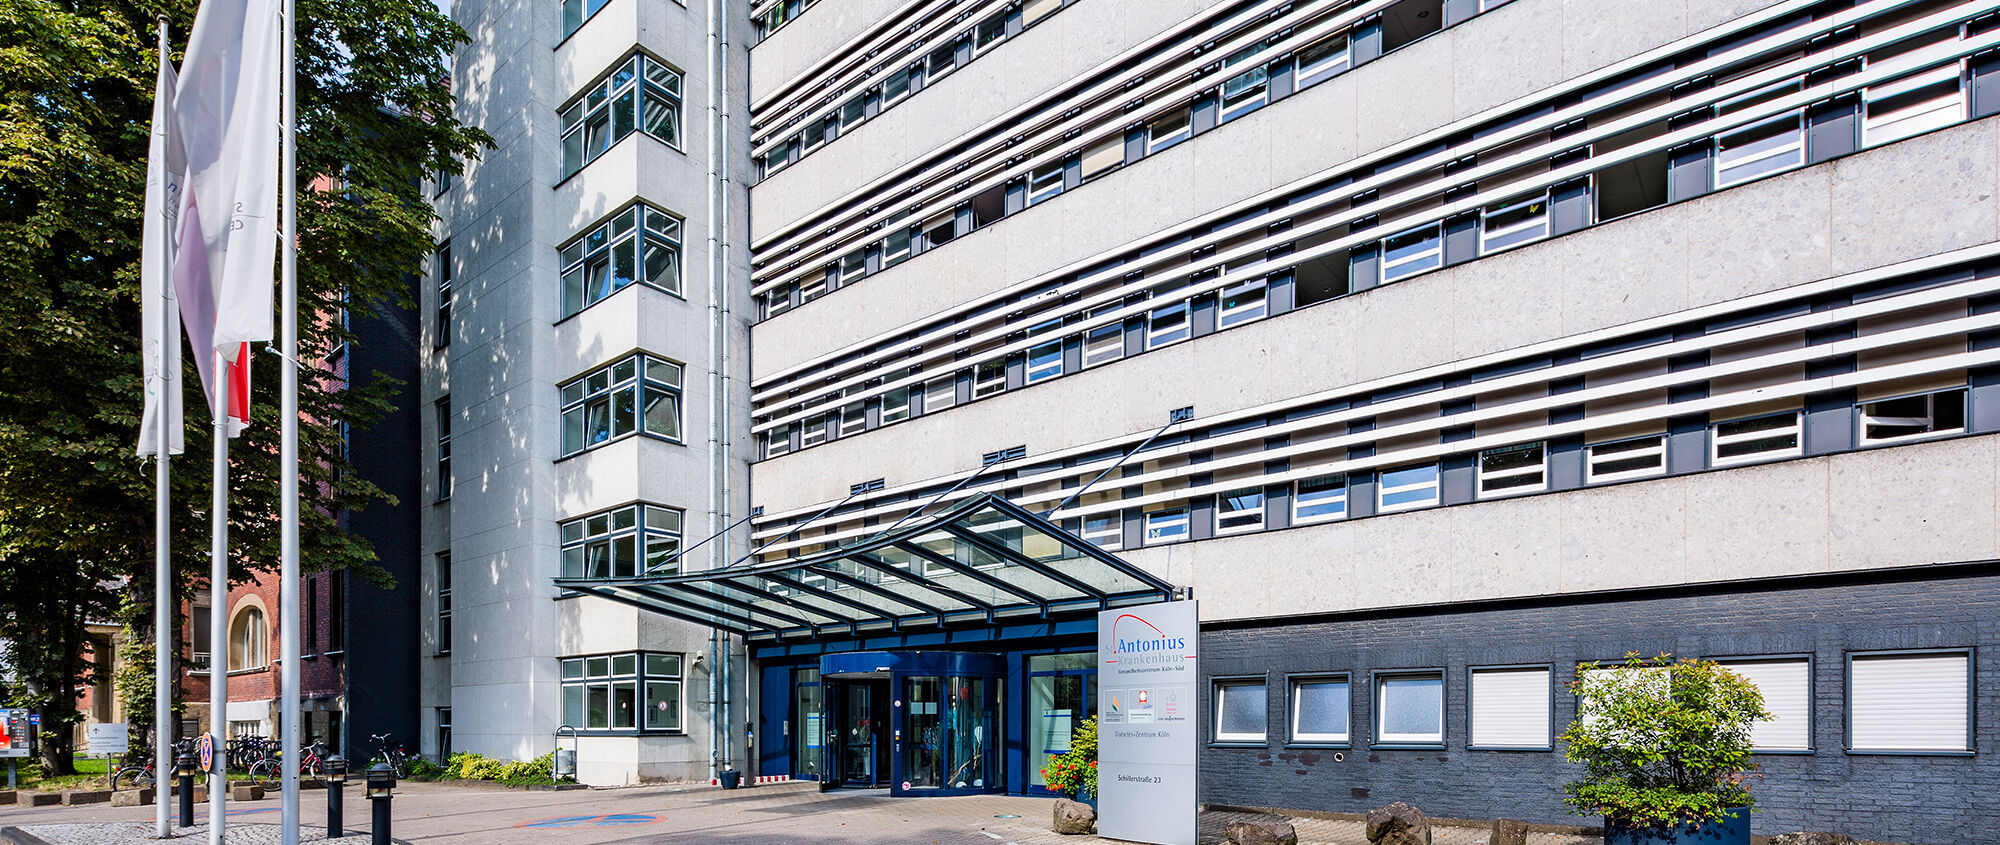 St Eduardus Krankenhaus Köln